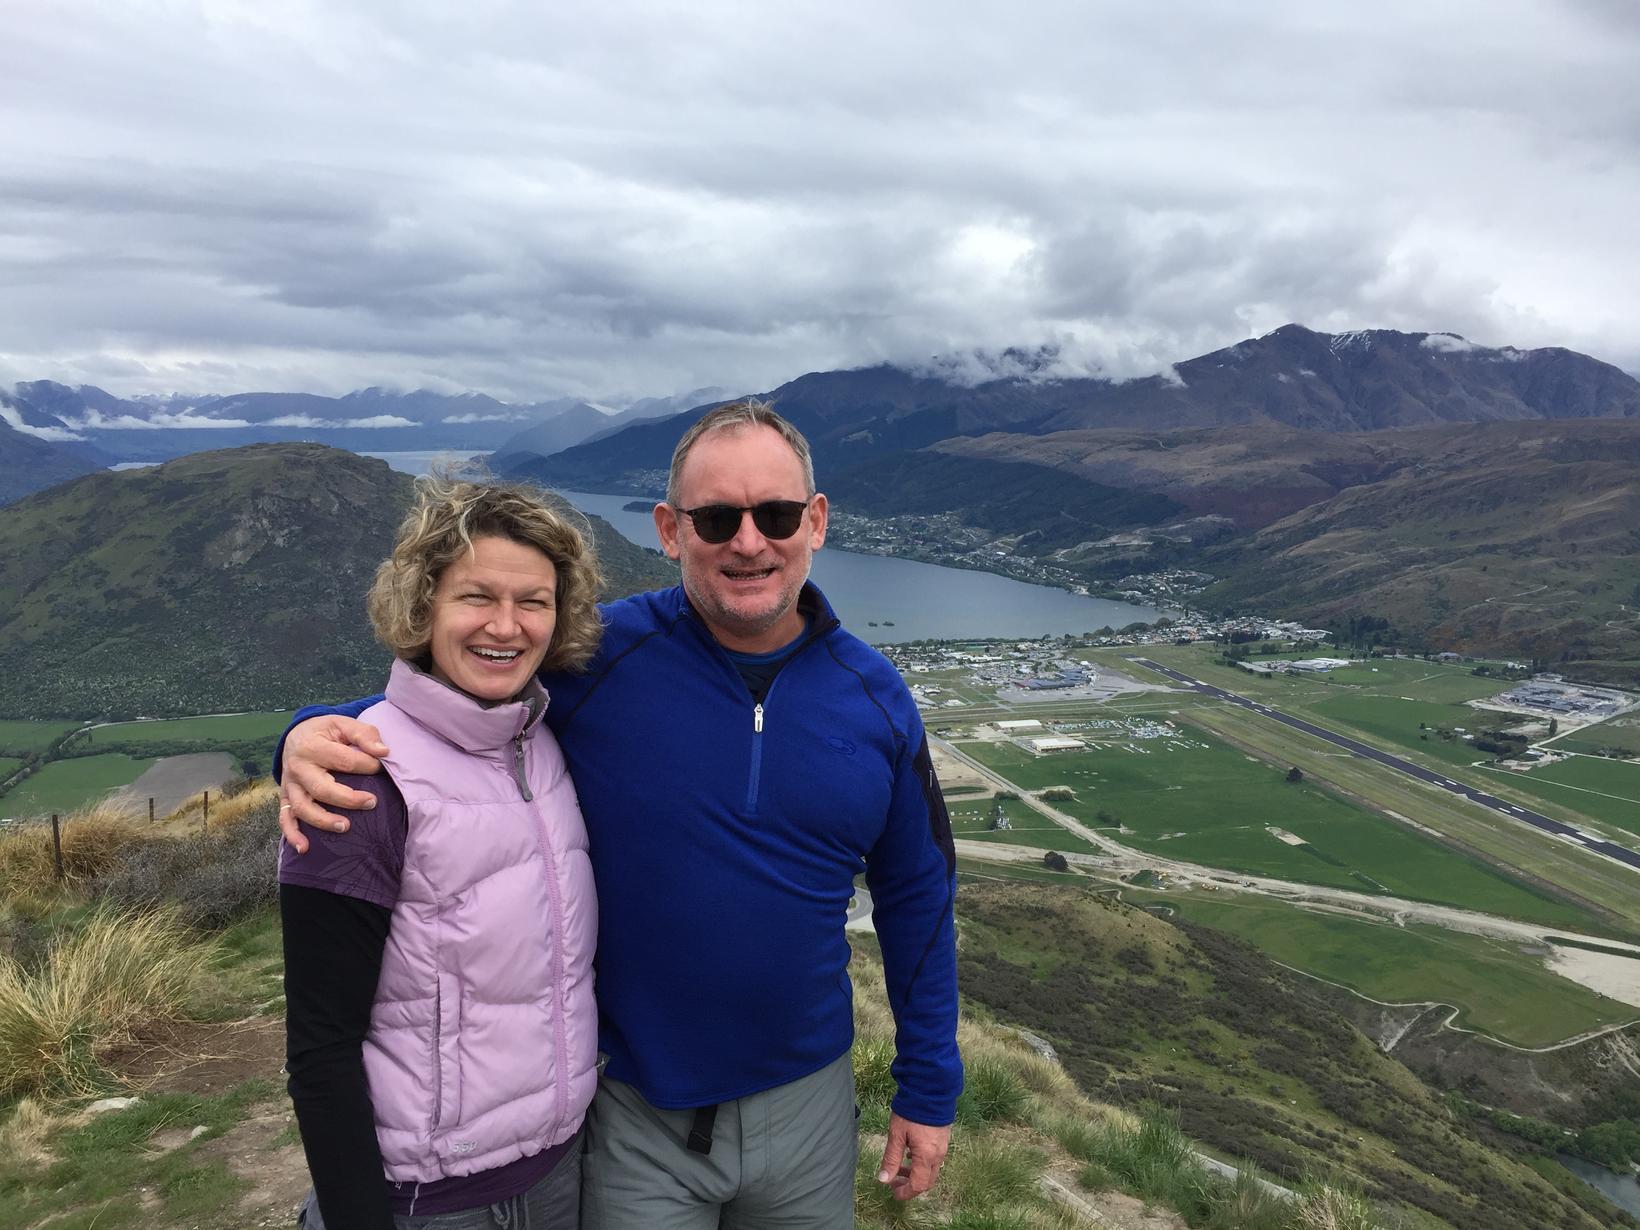 Marla & Mark from Auckland, New Zealand